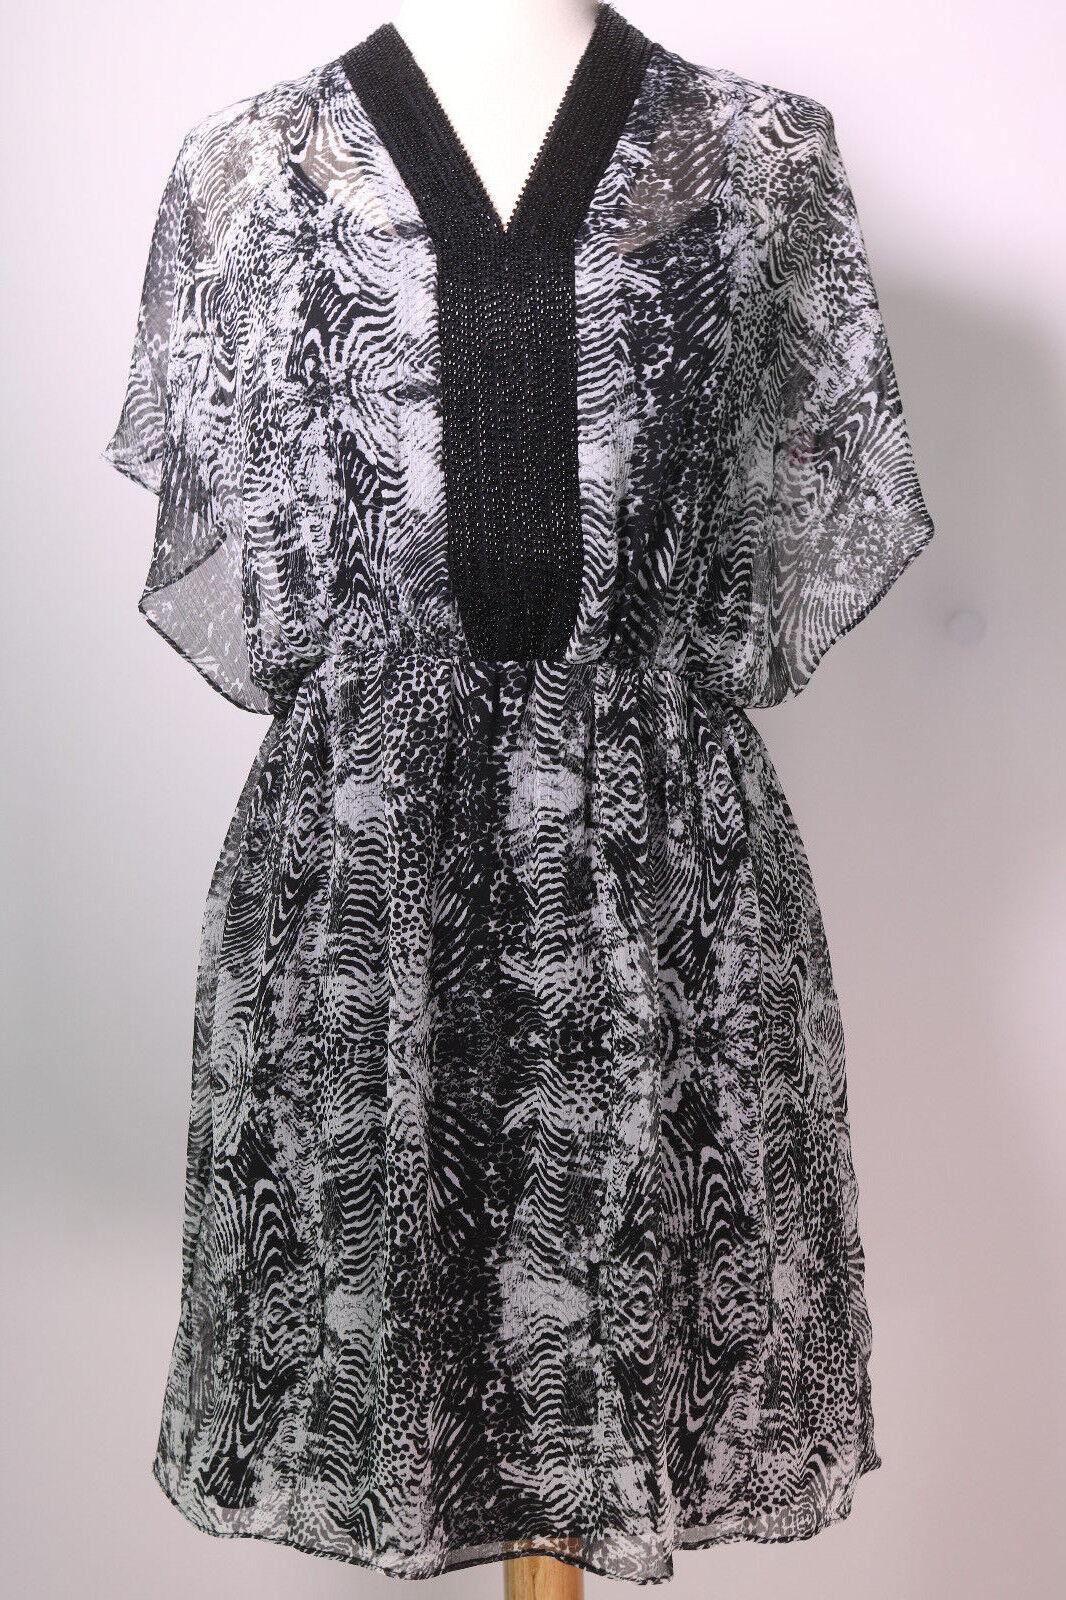 Belle Badgley Mischka Geo Short Sleeve Shirt Dress Size 6 New  159